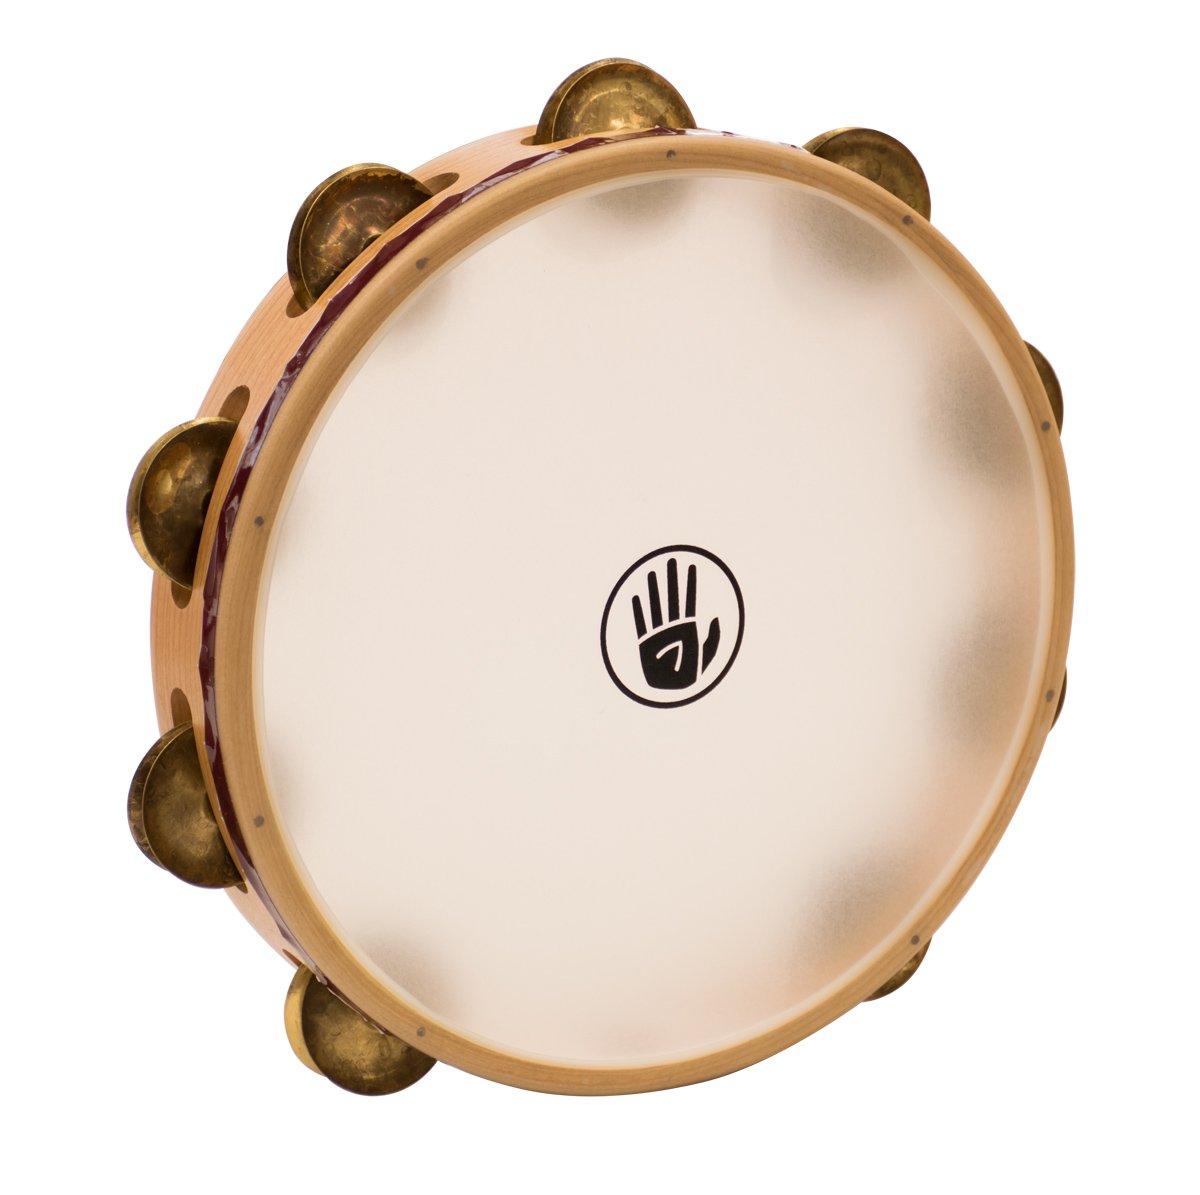 "S3 Seriesâ""¢ Tambourine Single row 10'' - Aged Brass,"